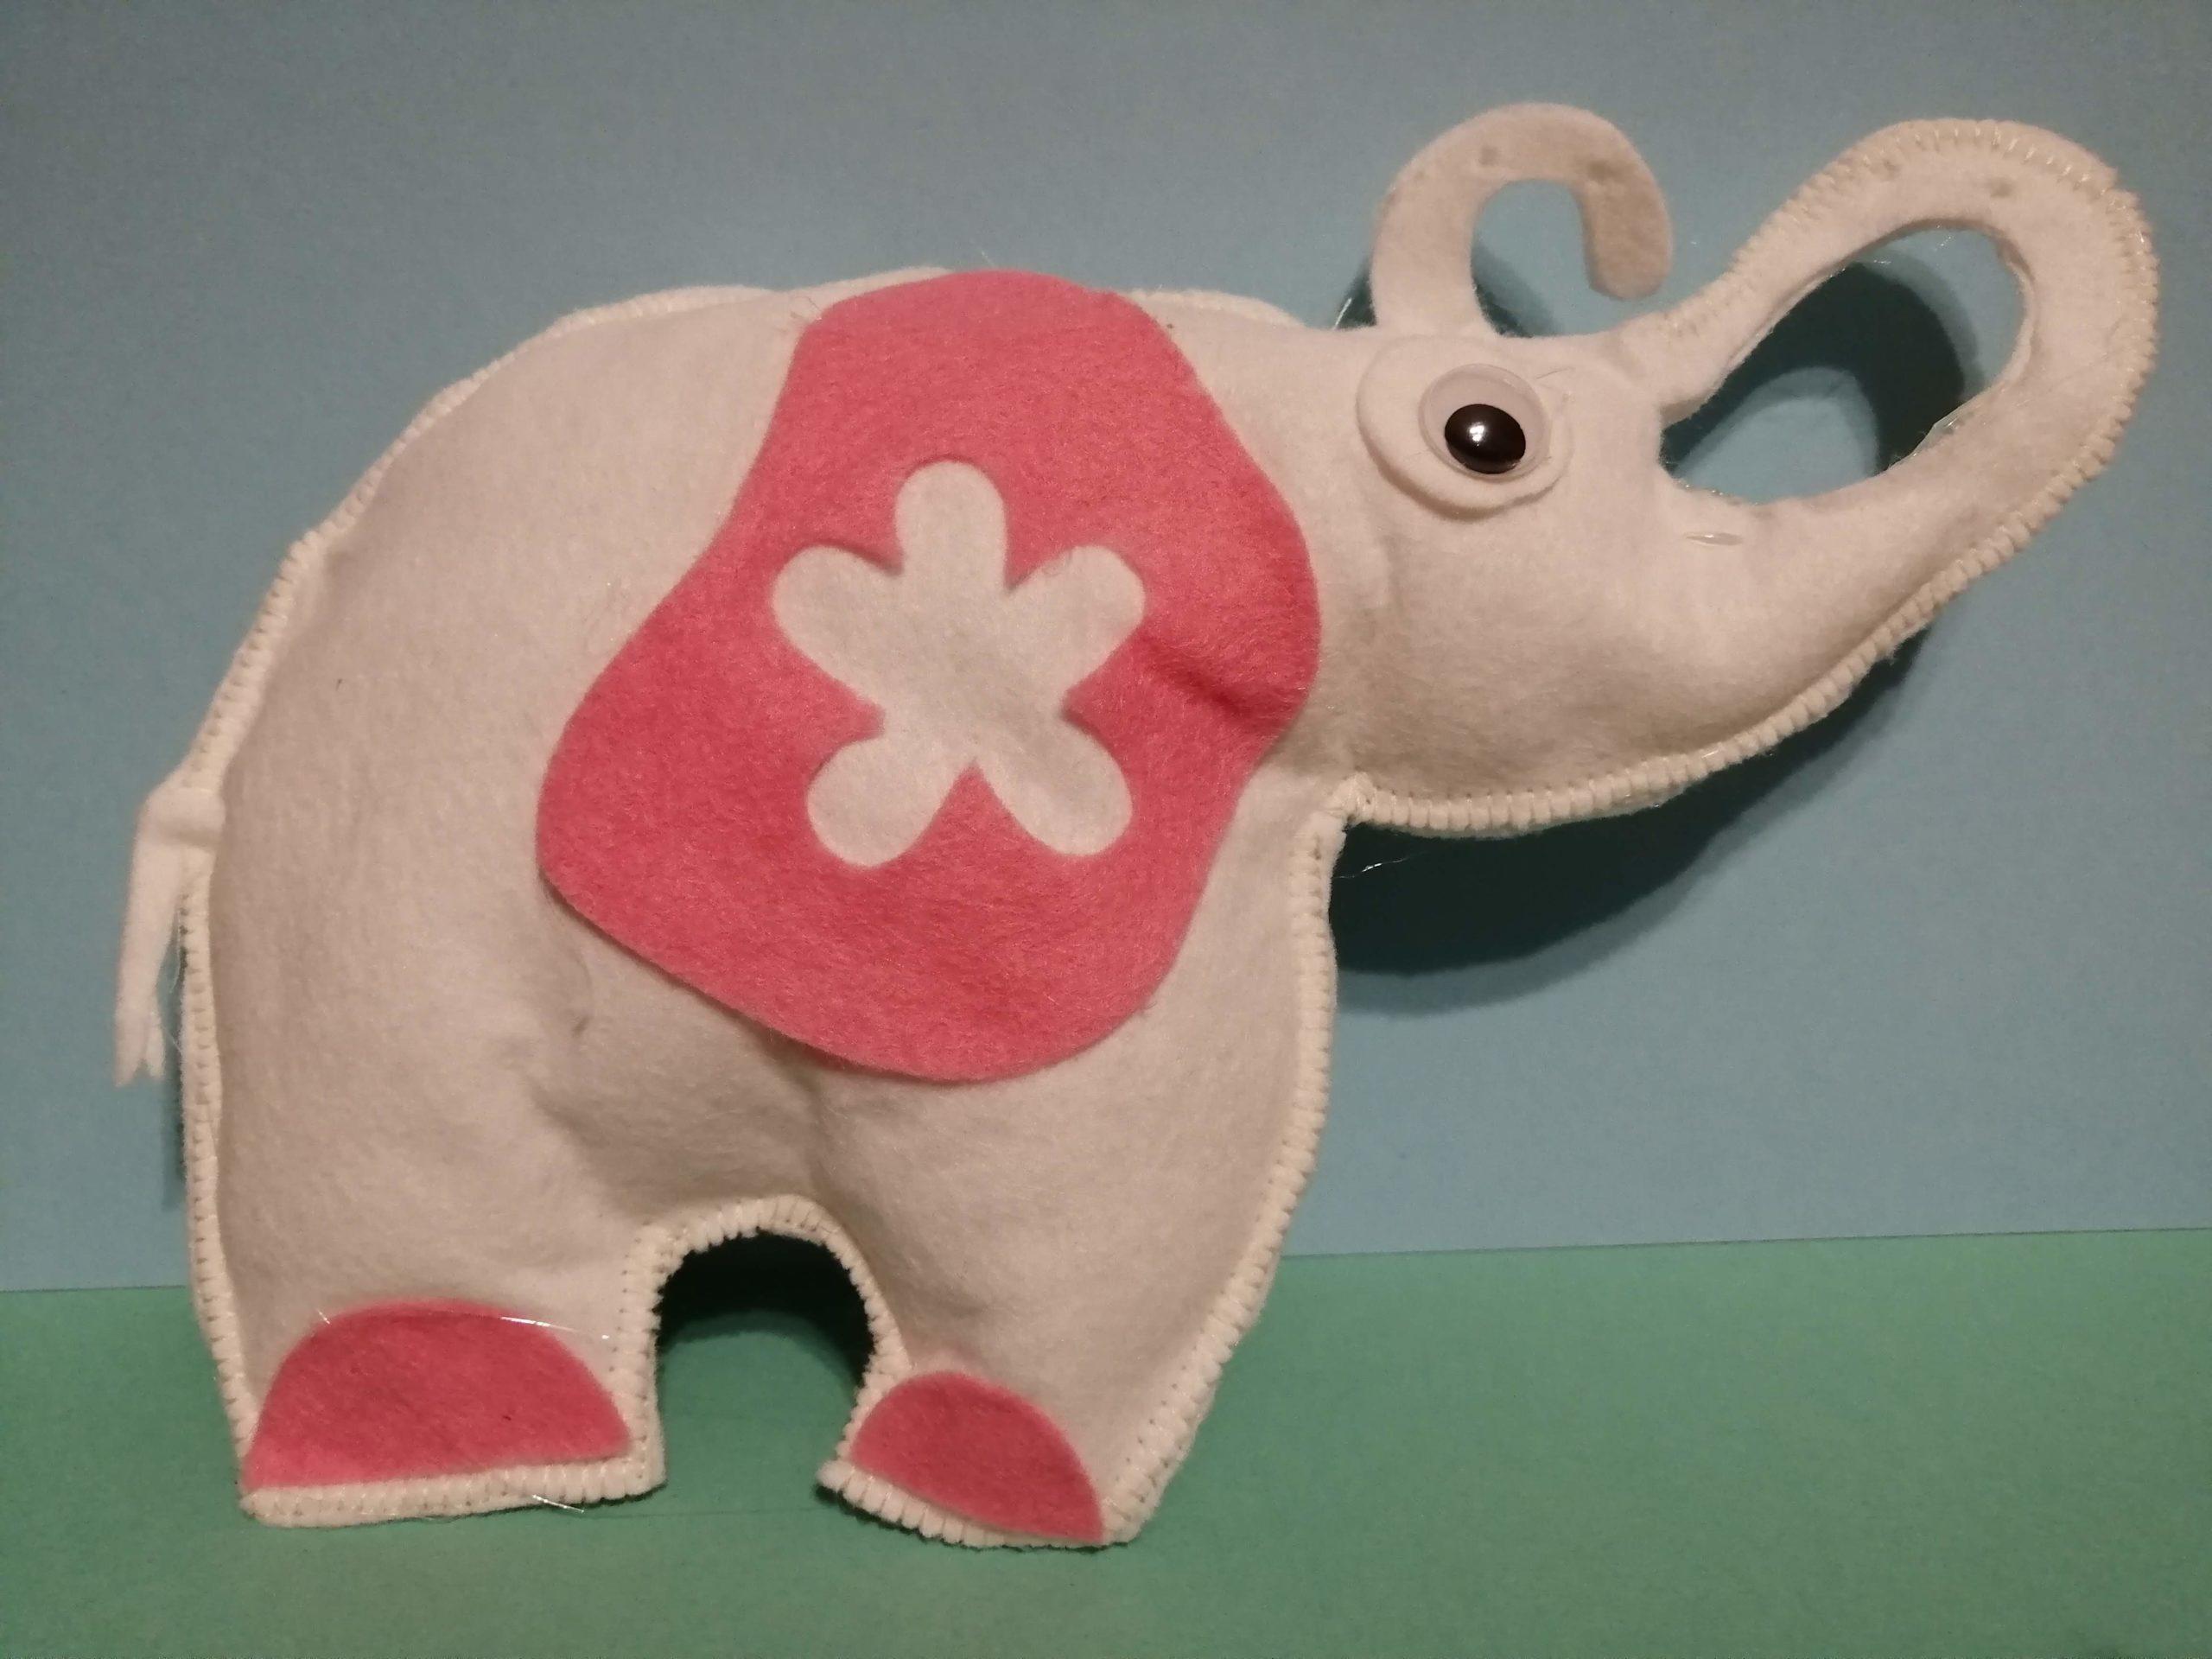 Elefante in feltro Cricut Maker